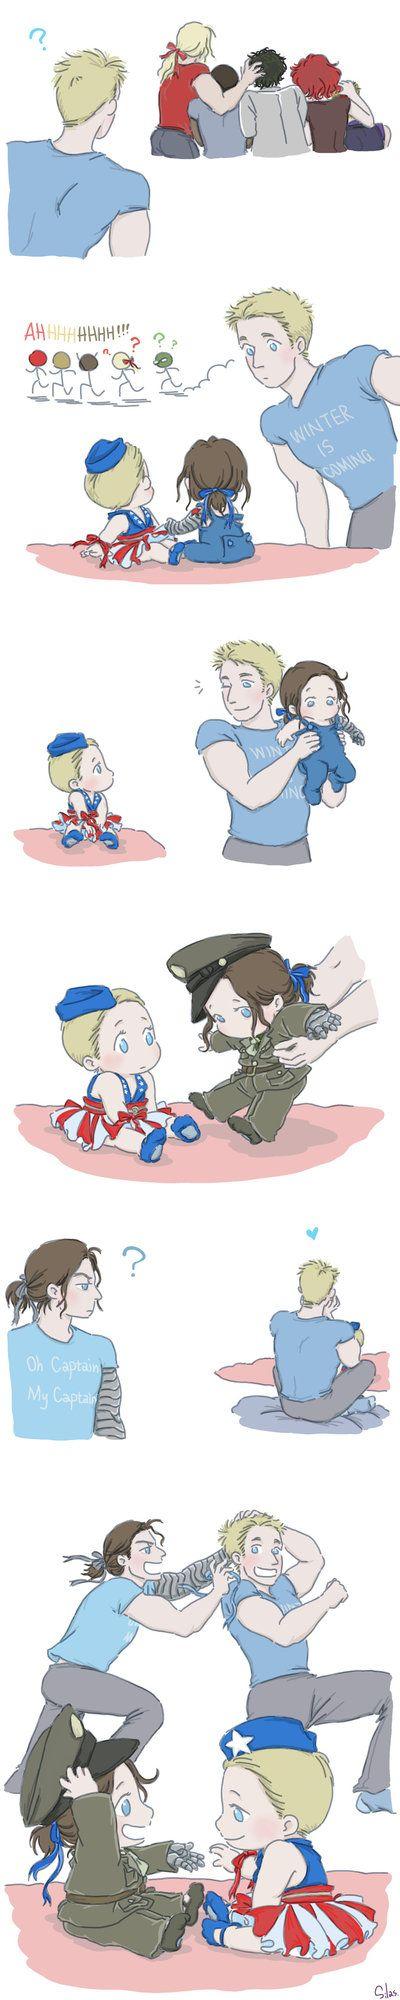 Steve and Bucky Babies: Ribbon 2 by SilasSamle *tiny bucky in uniform <3*